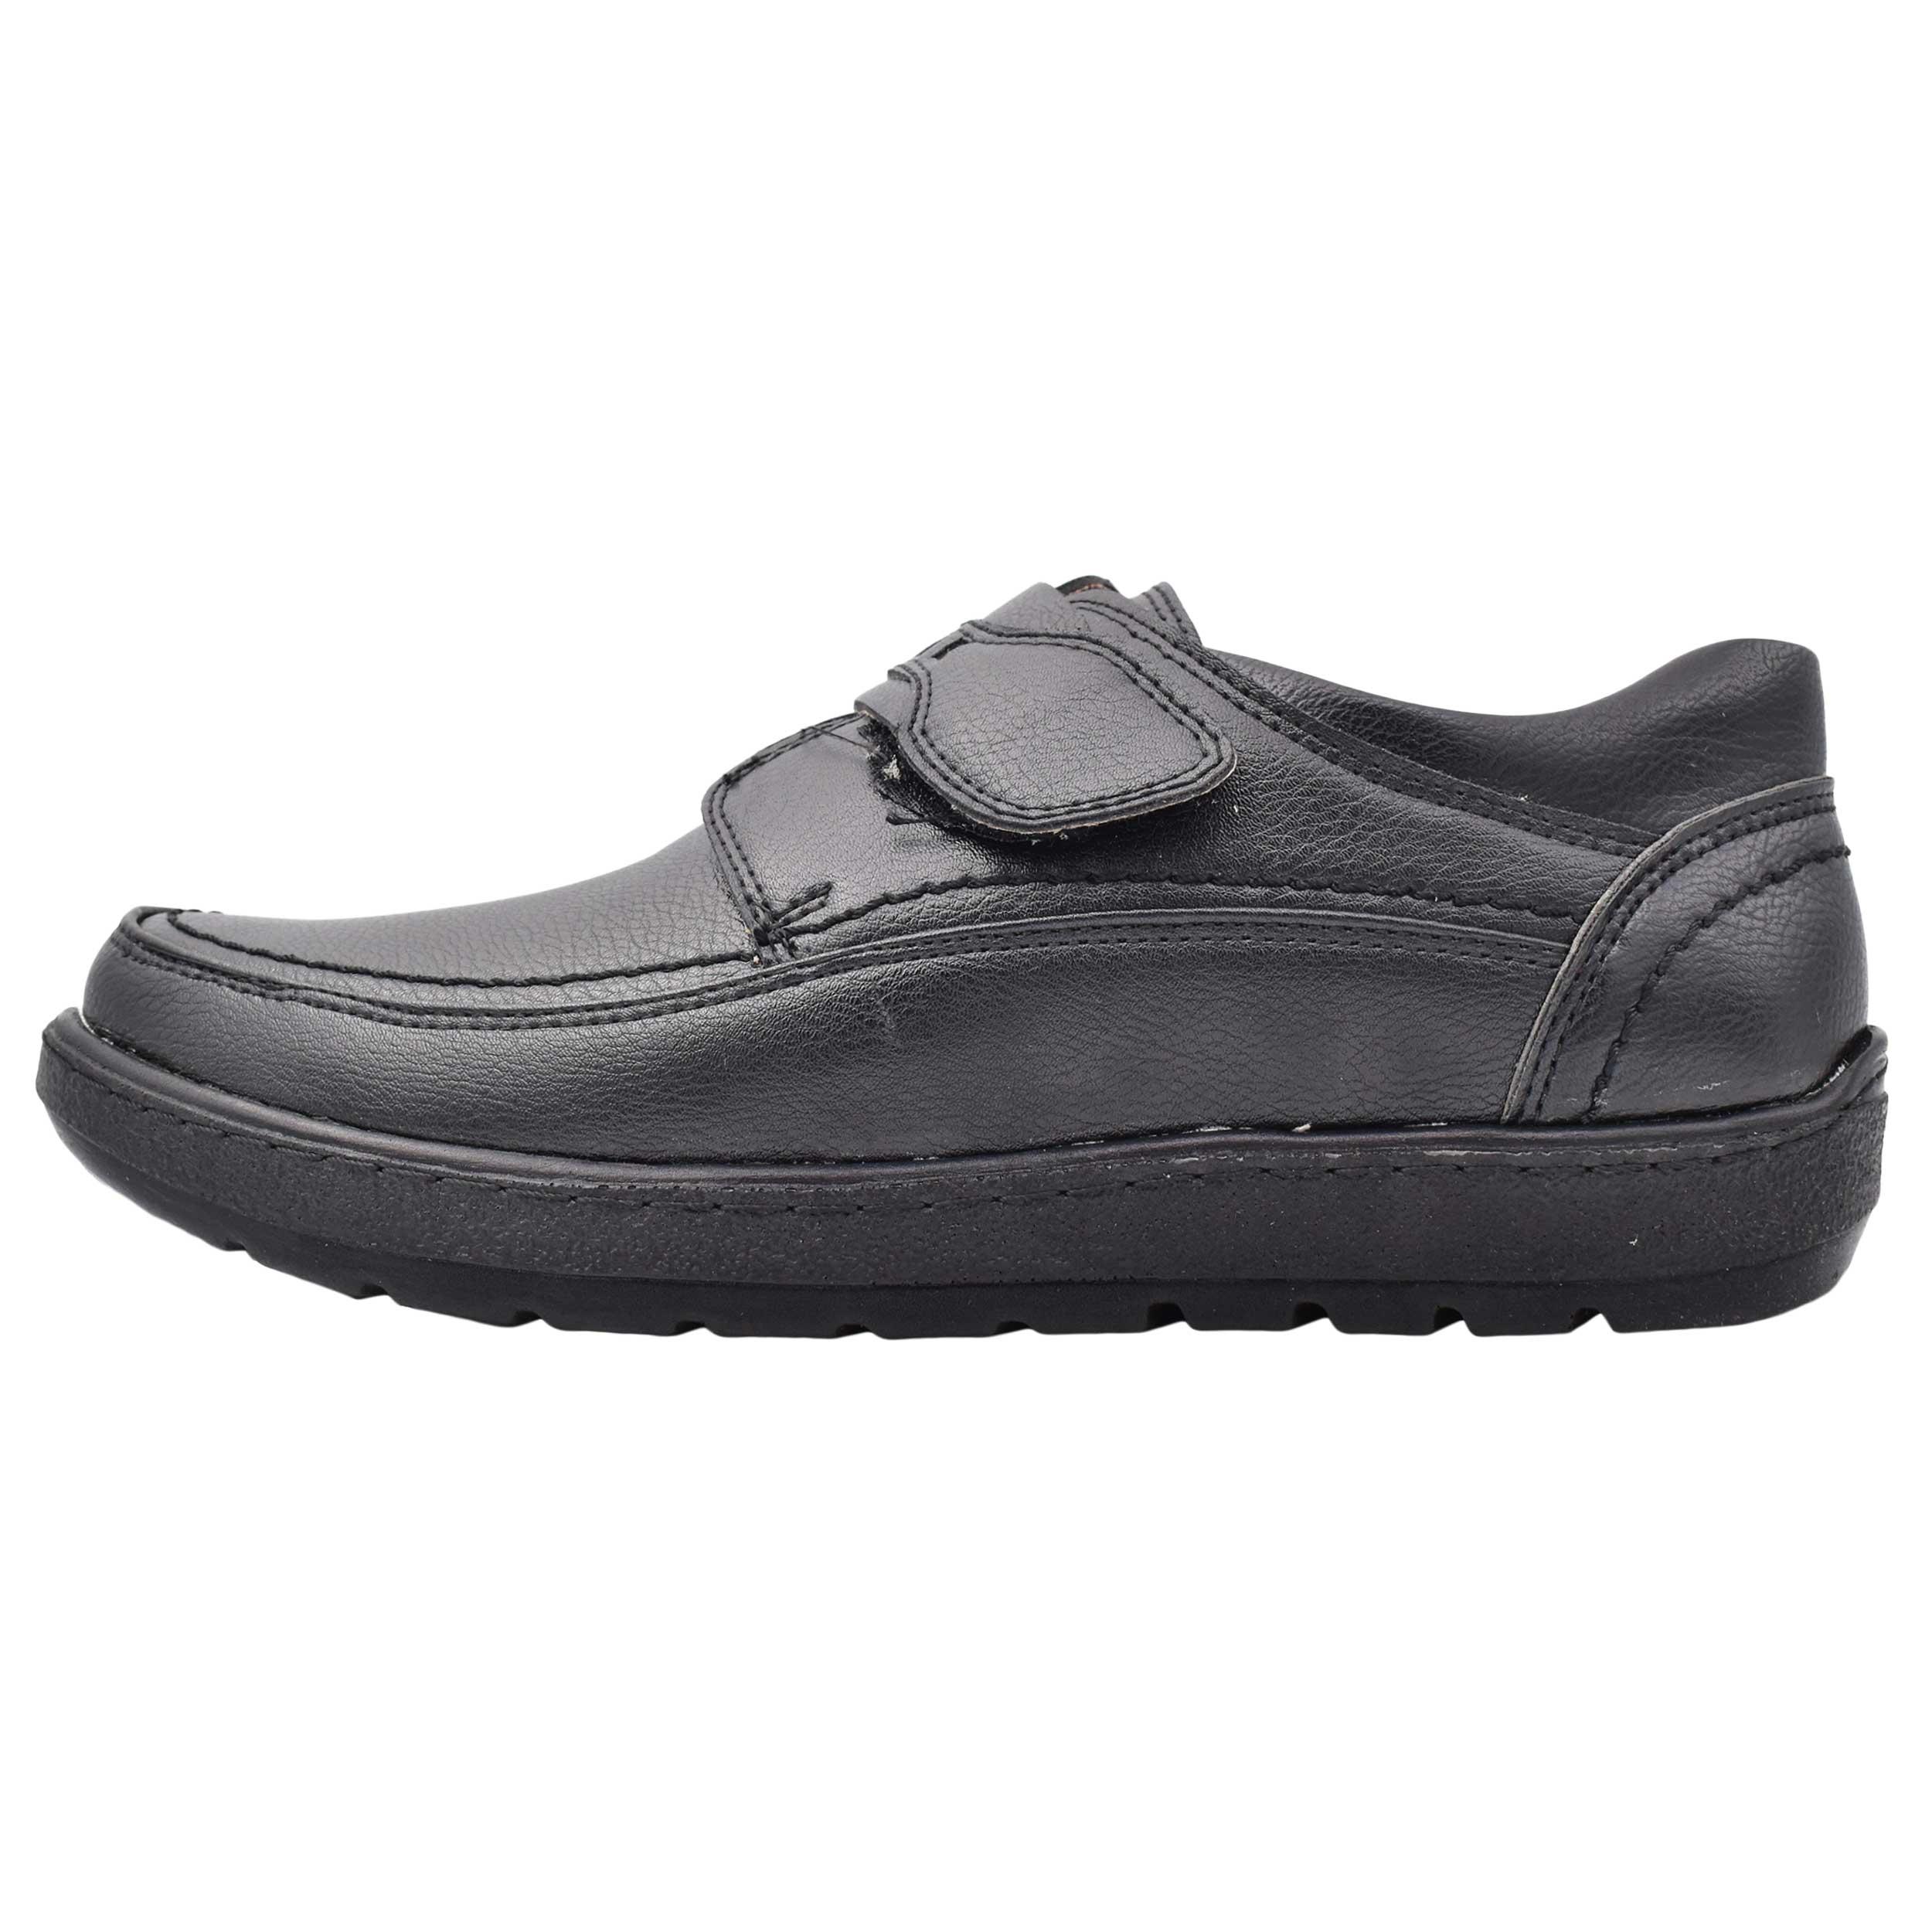 کفش روزمره مردانه مدل میلان کد 7606